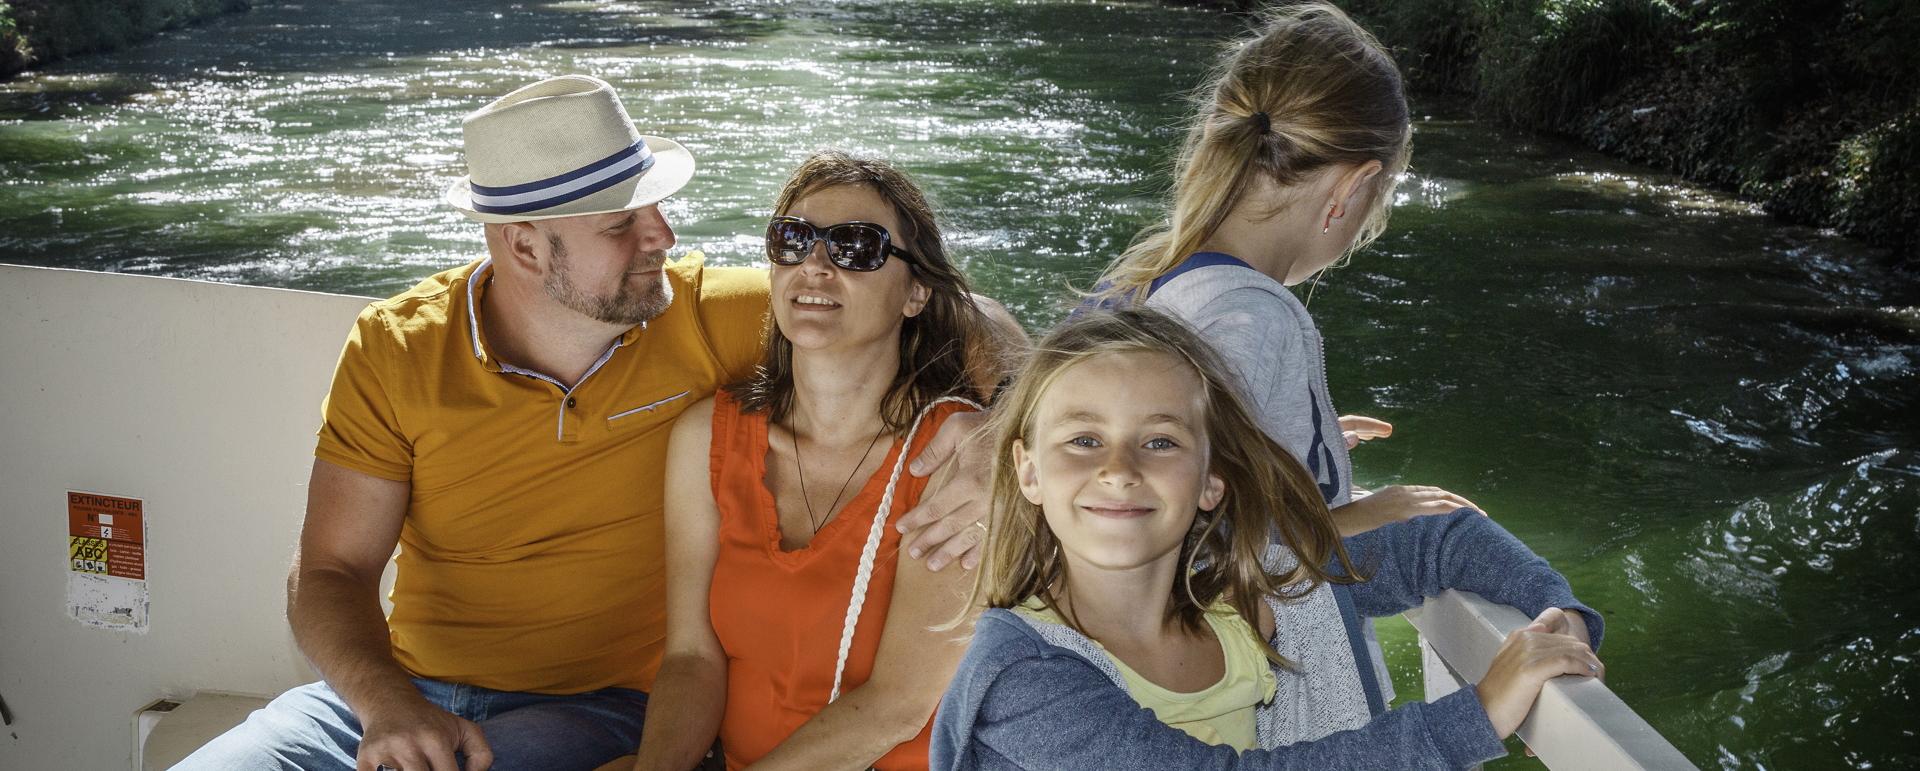 Famille Tourisme Occitanie